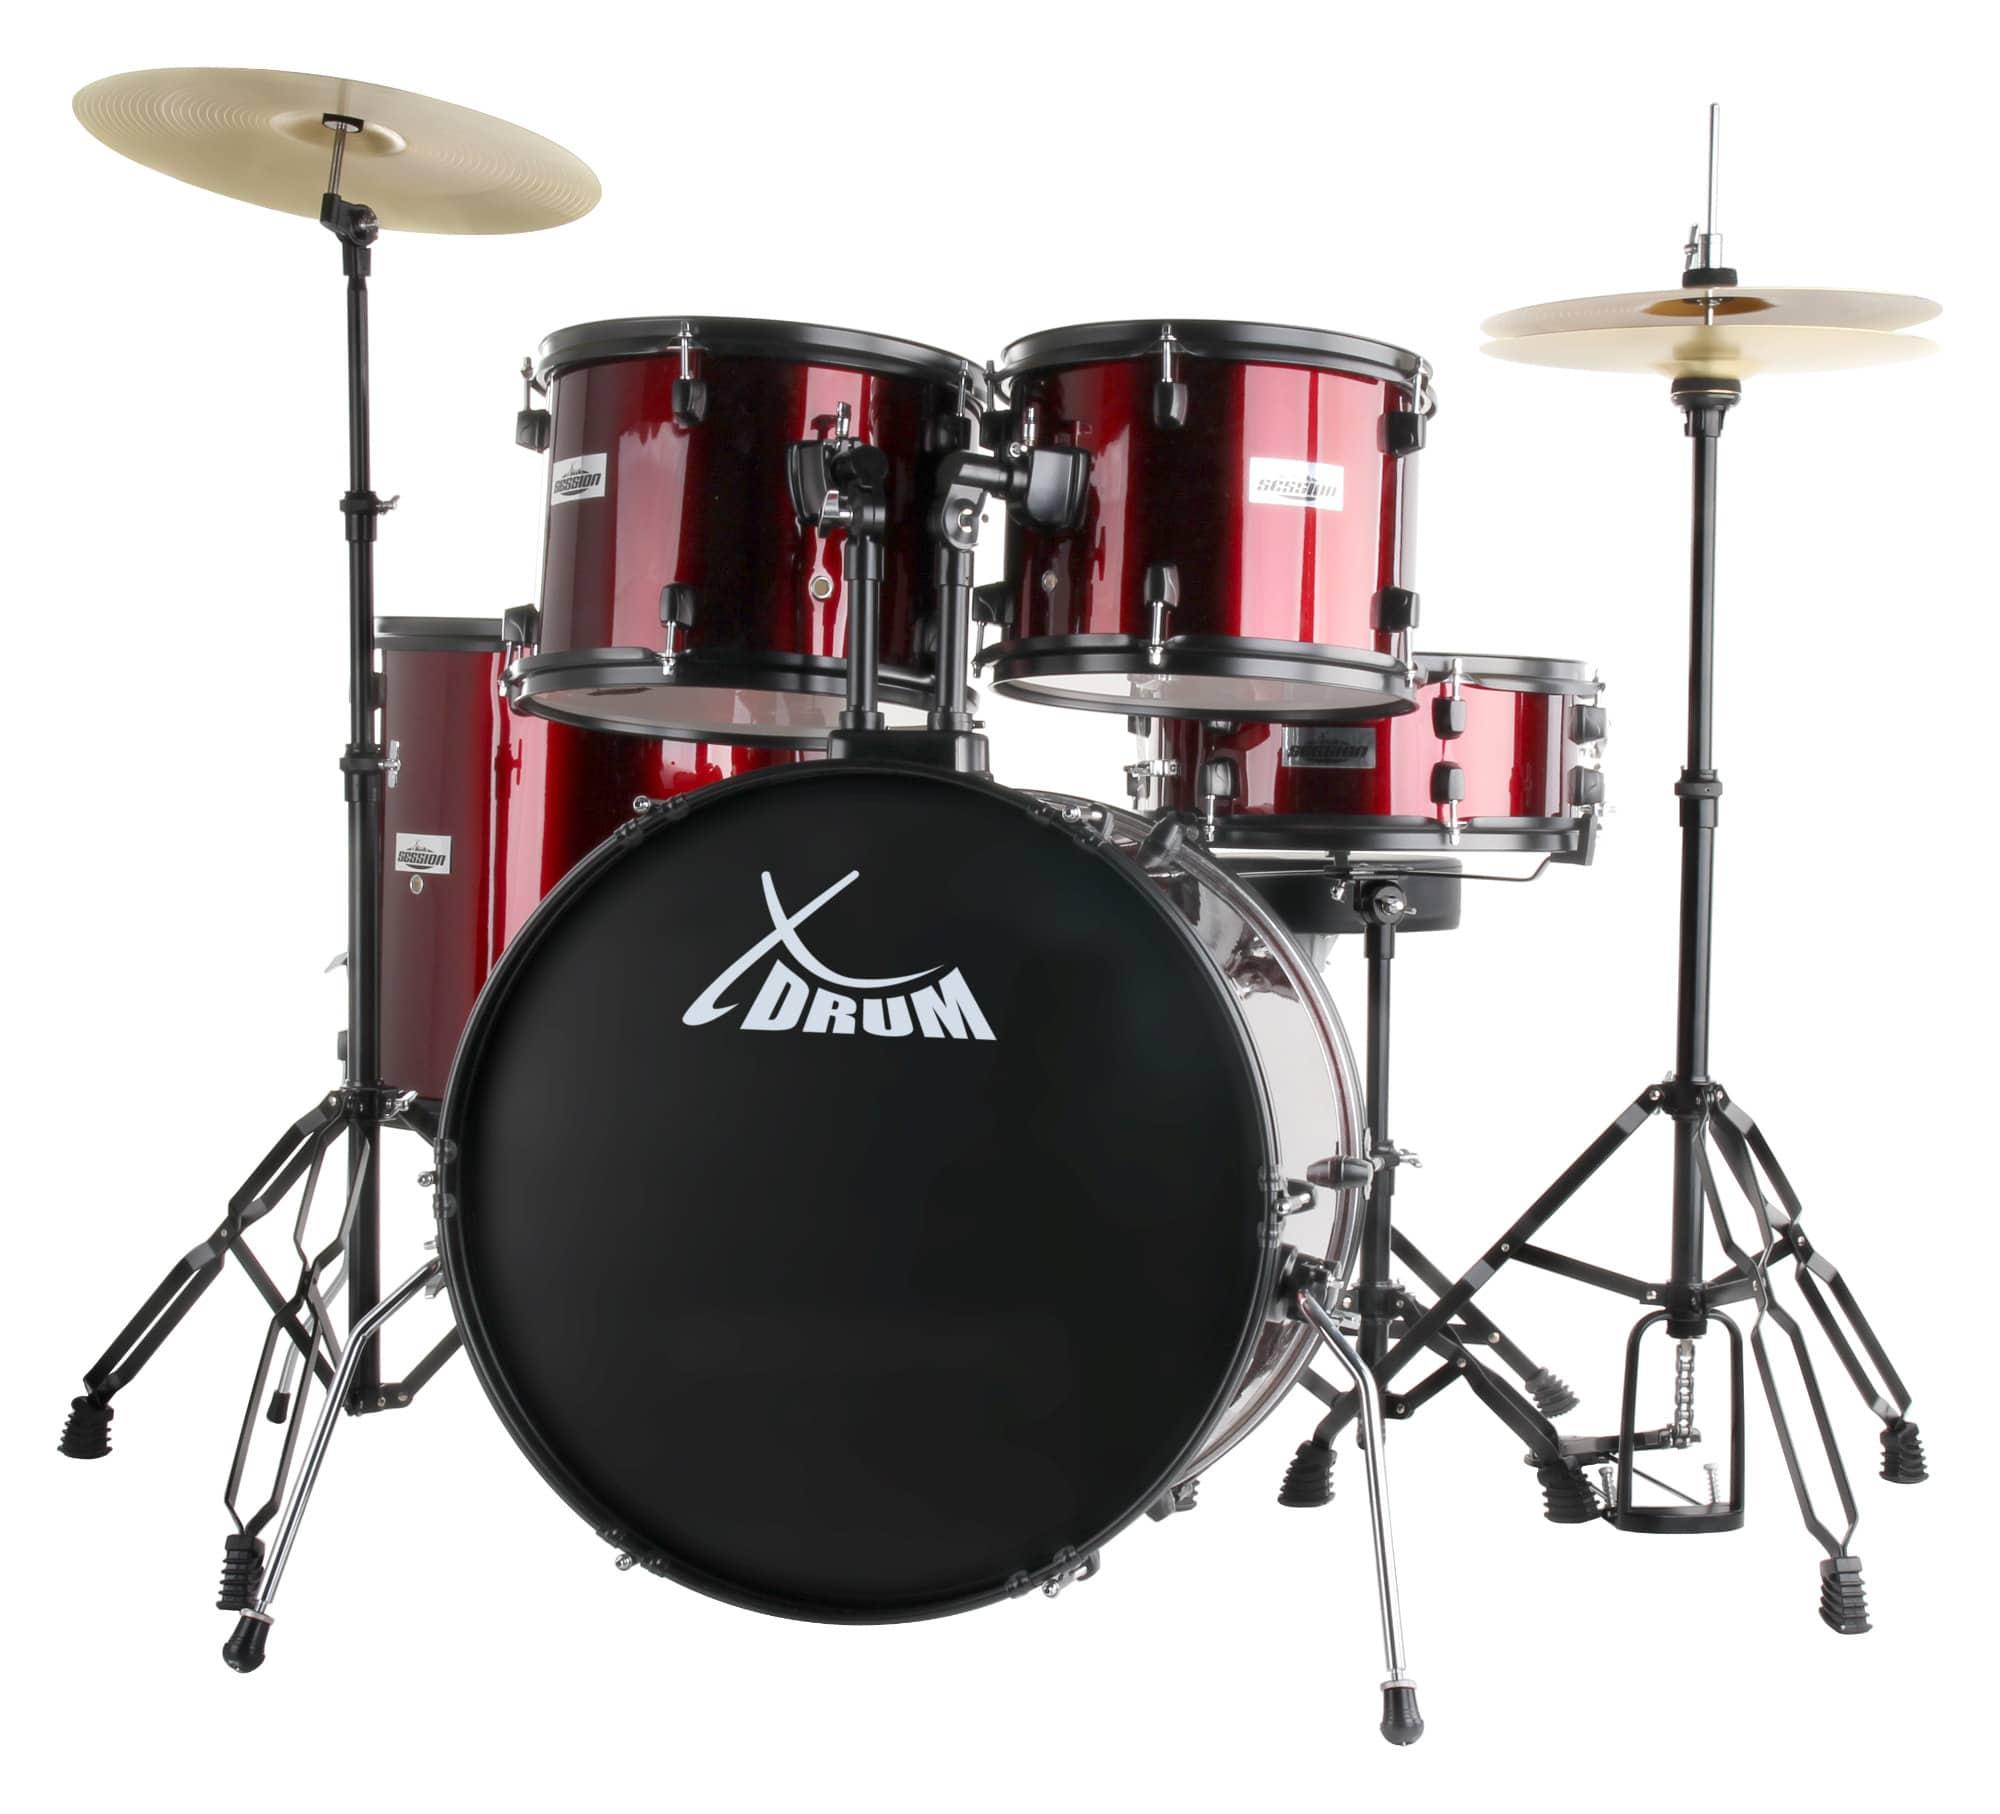 XDrum Rookie 22' Standard Schlagzeug Komplettset Ruby Red inkl. Schule DVD